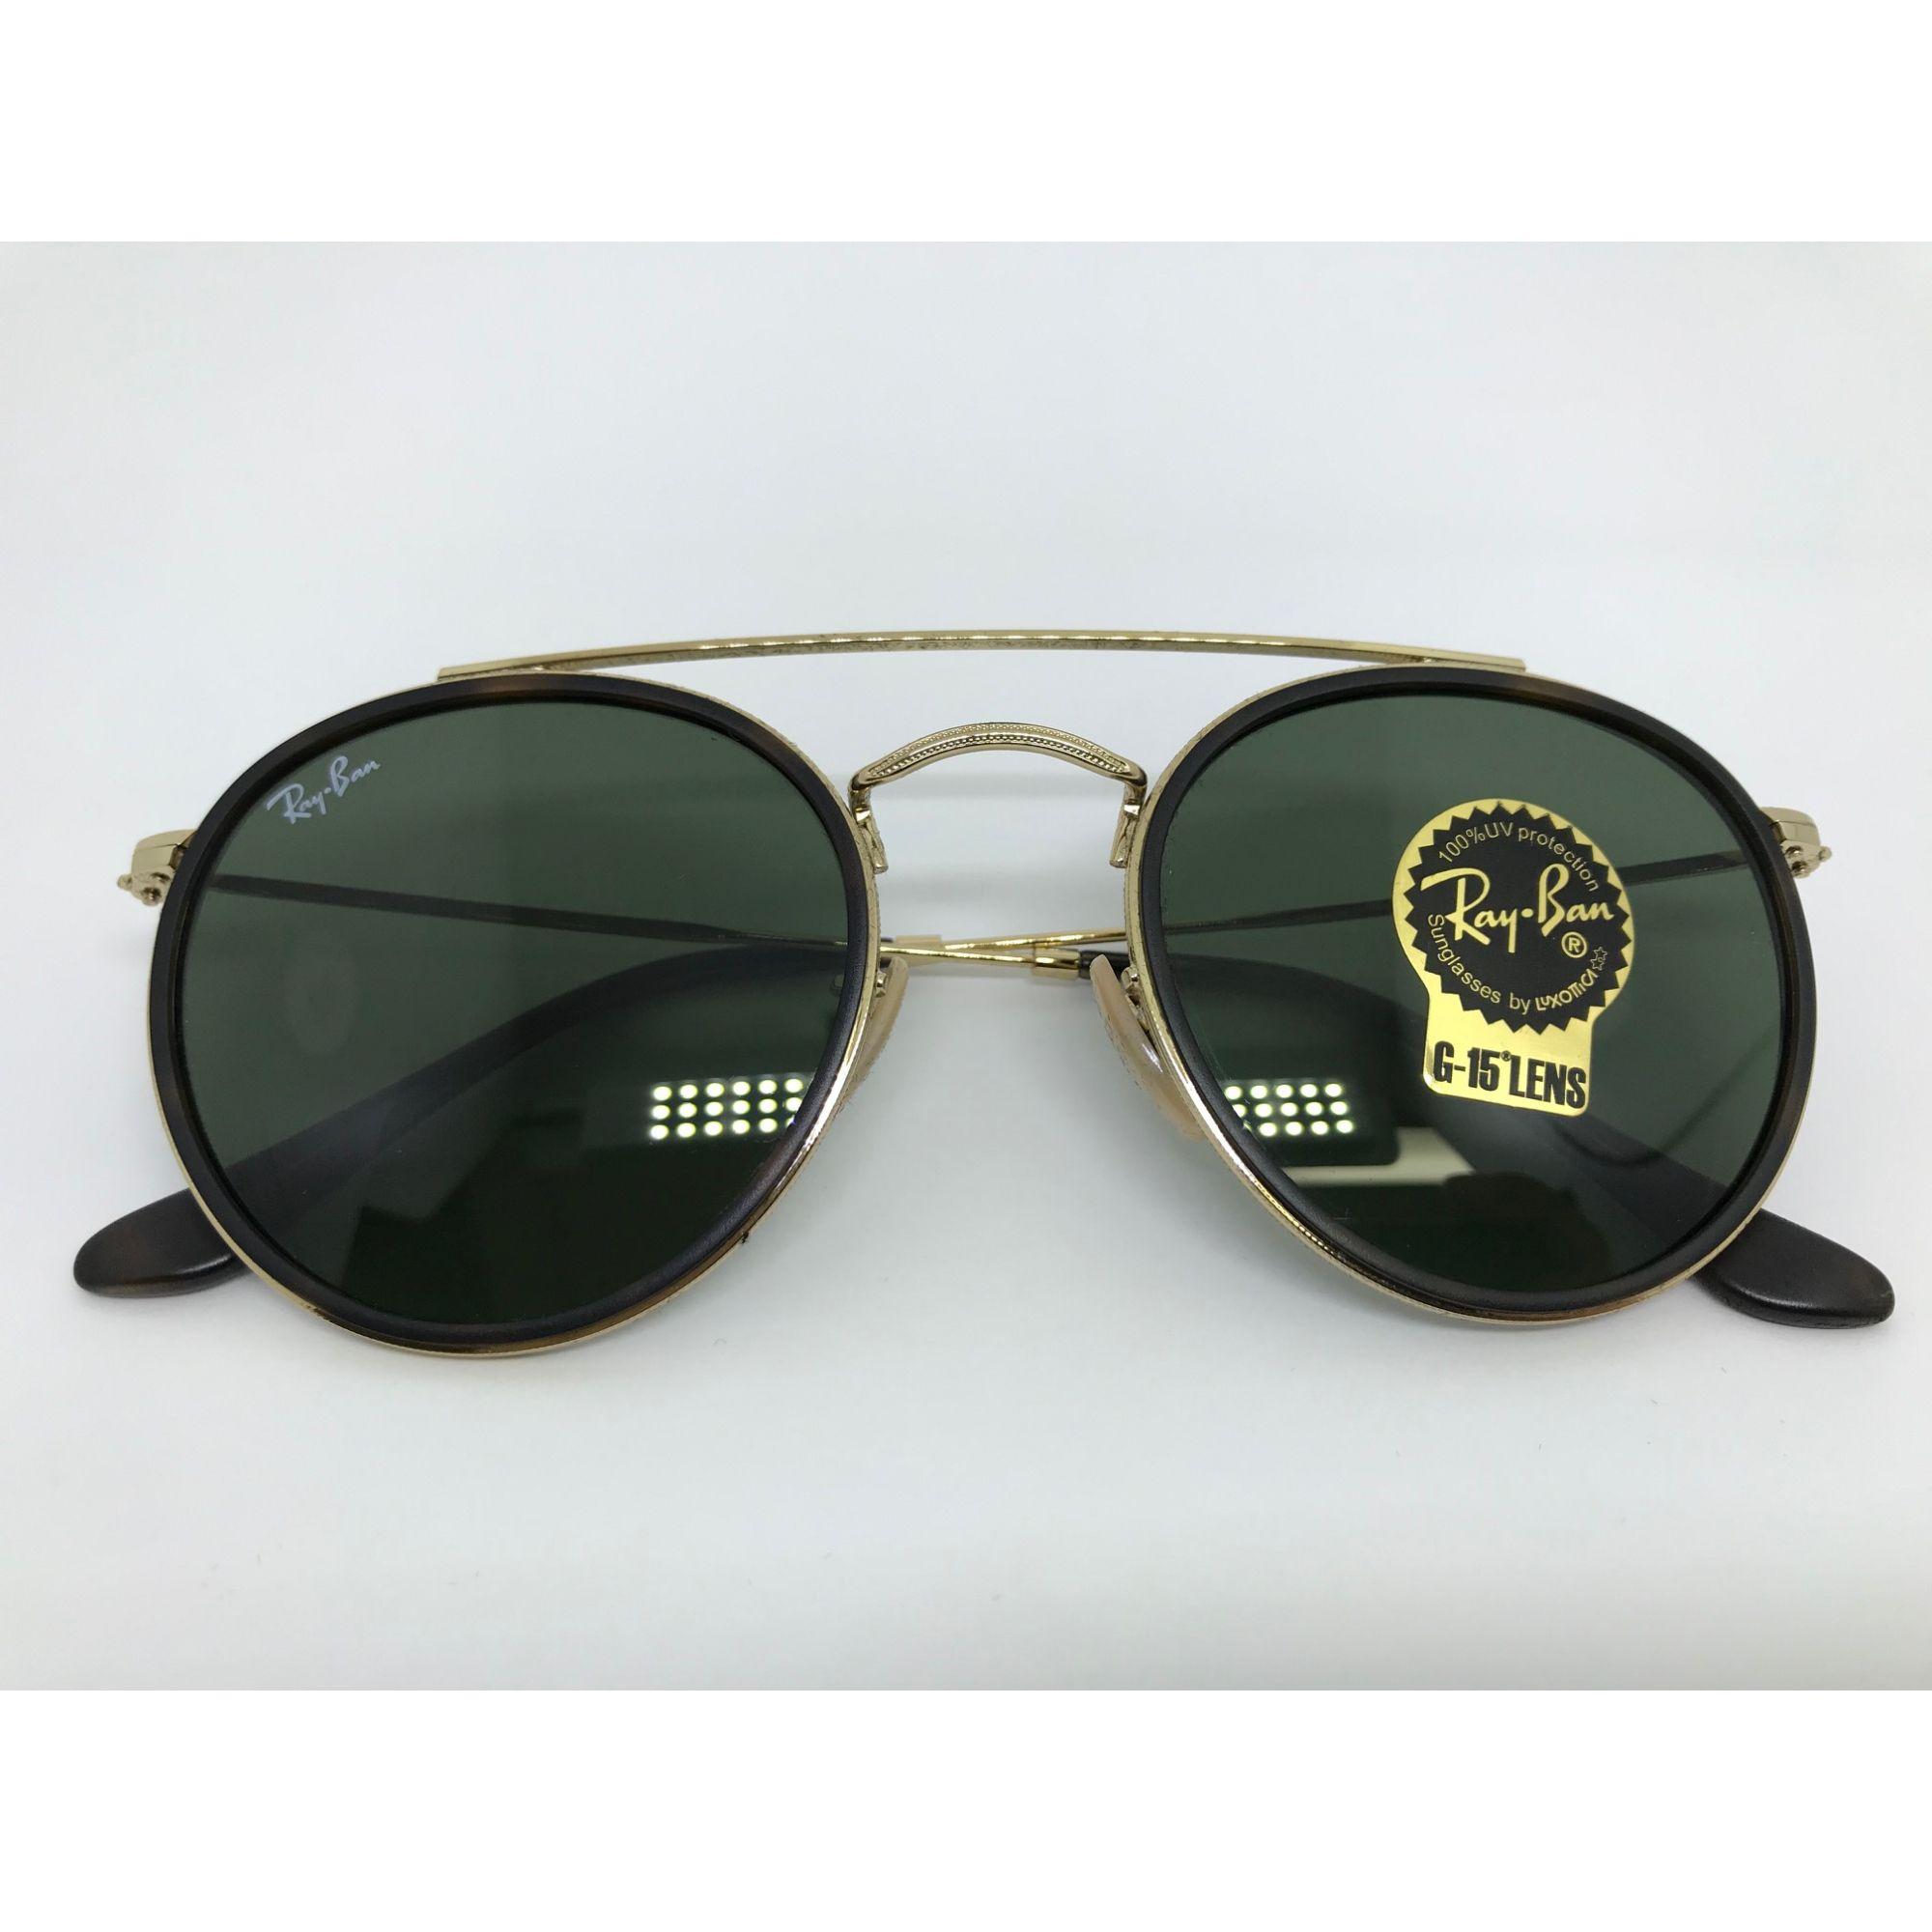 56da32426ec4a Oculos de sol Ray Ban Round Double Bridge RB 3647N 001 51